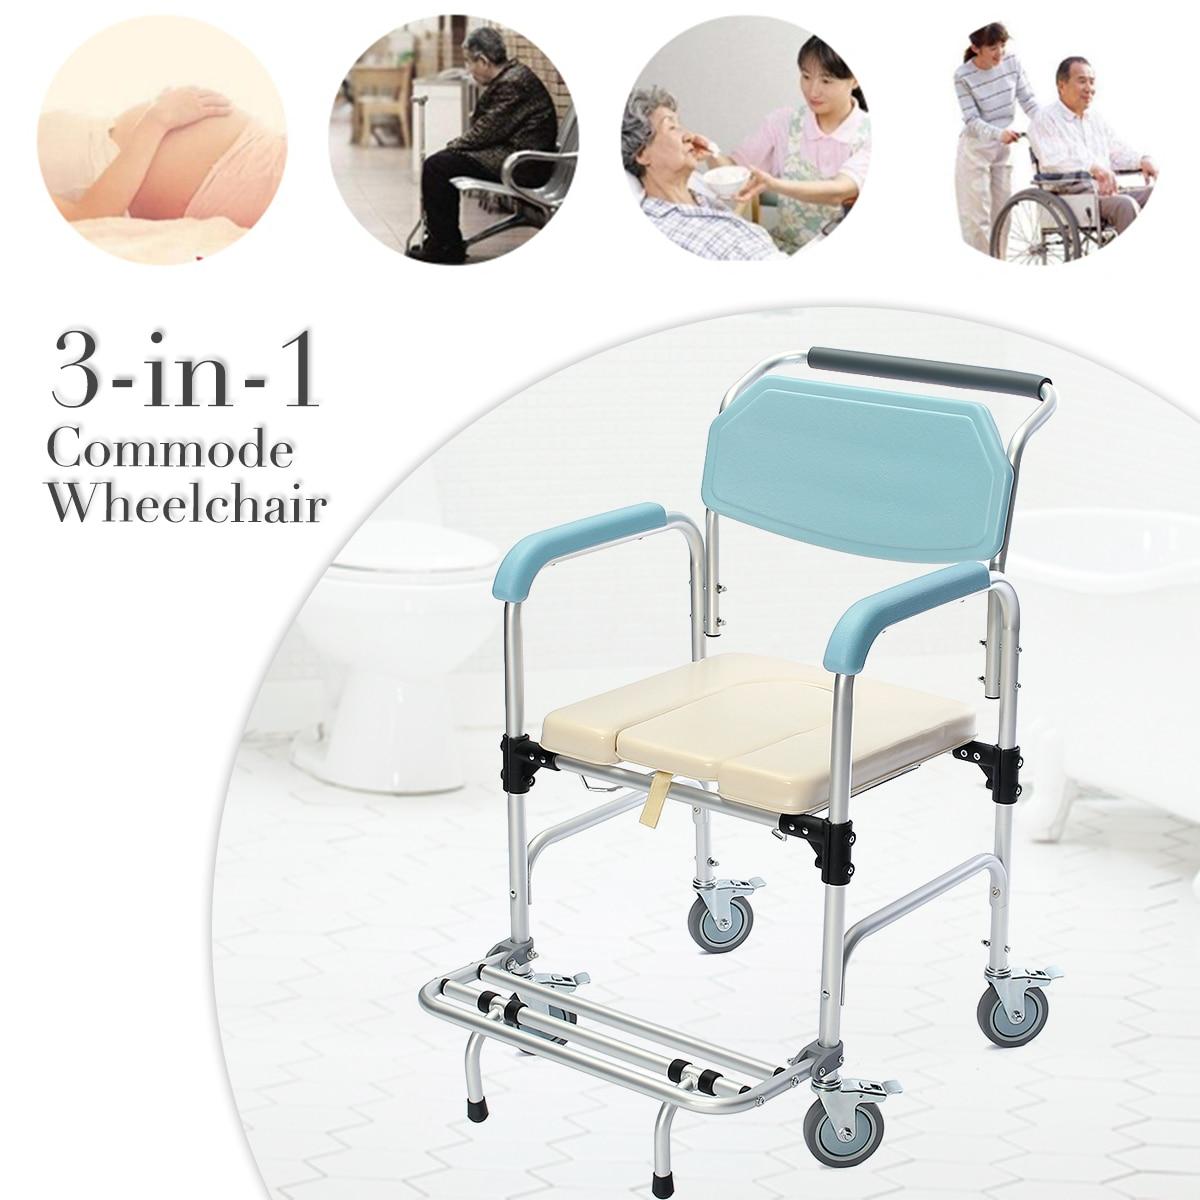 все цены на 3-in-1 Commode Wheelchair Elder Folding Chair Bedside Toilet & Shower Seat Bathroom Rolling Chair Aluminum Alloy Waterproof